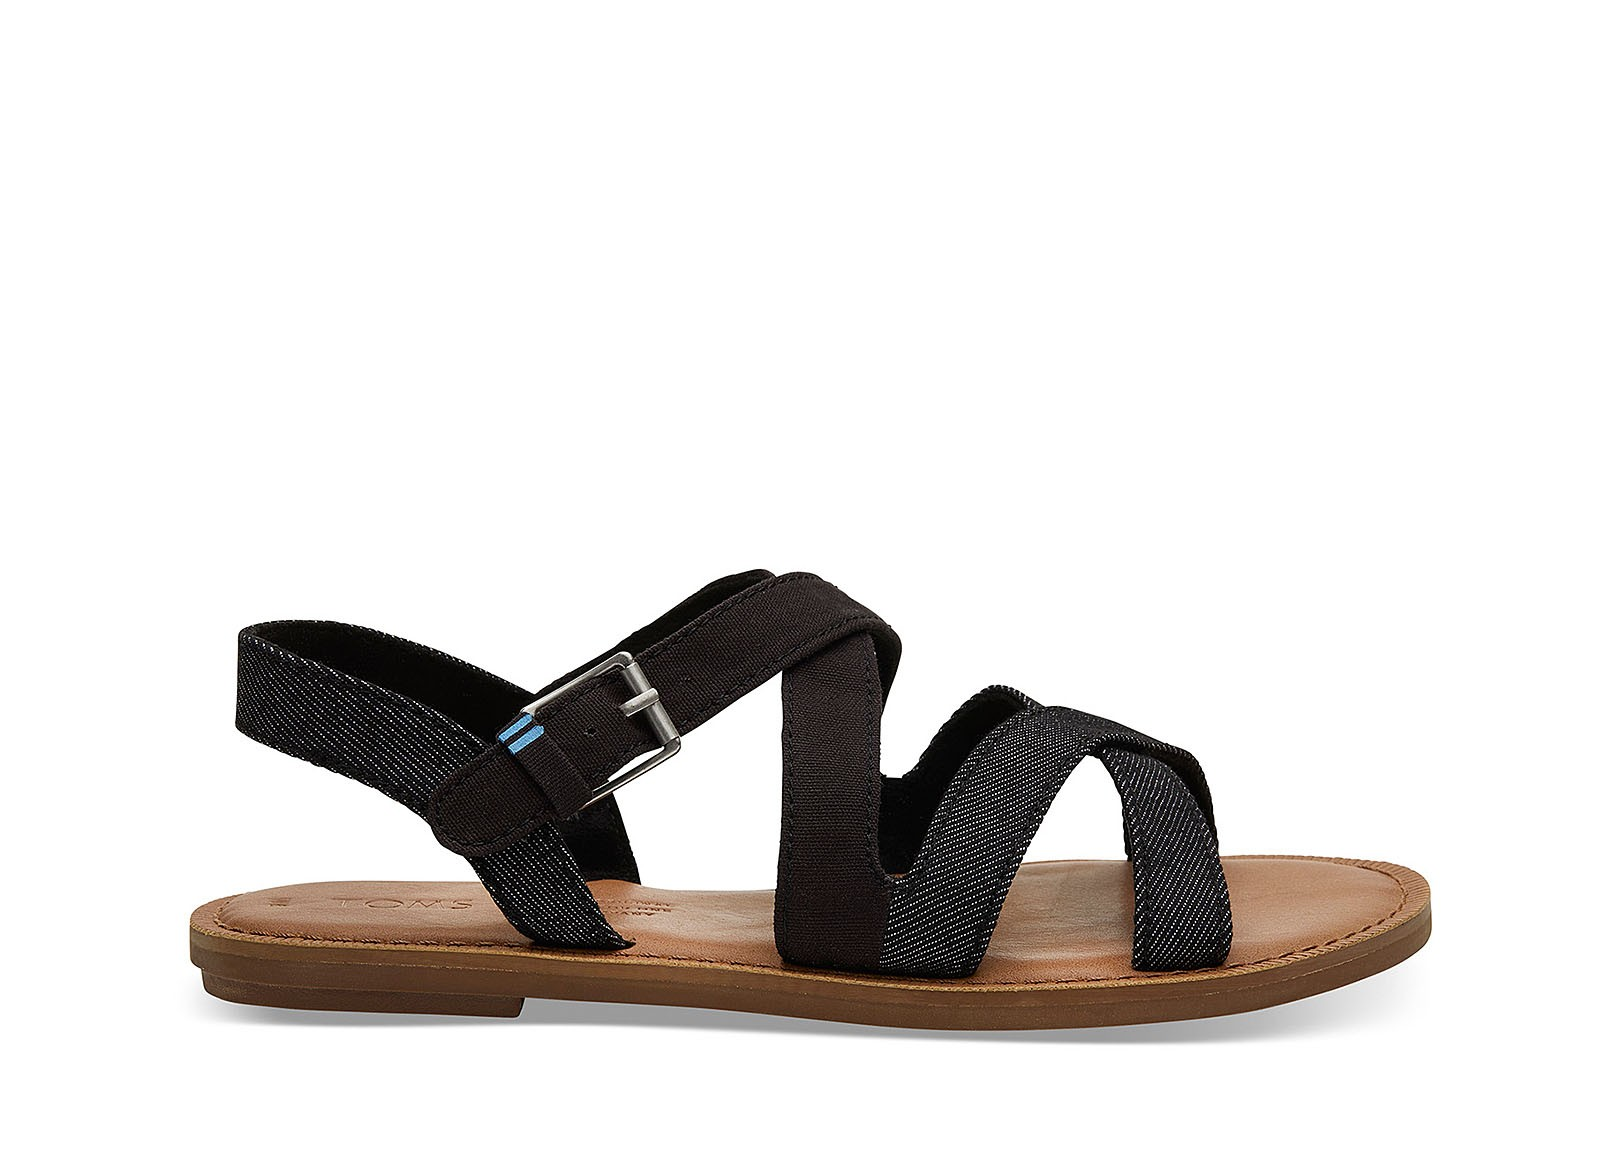 5c8f3720d05 Vegan Sandal | TOMS Sicily Black | avesu VEGAN SHOES